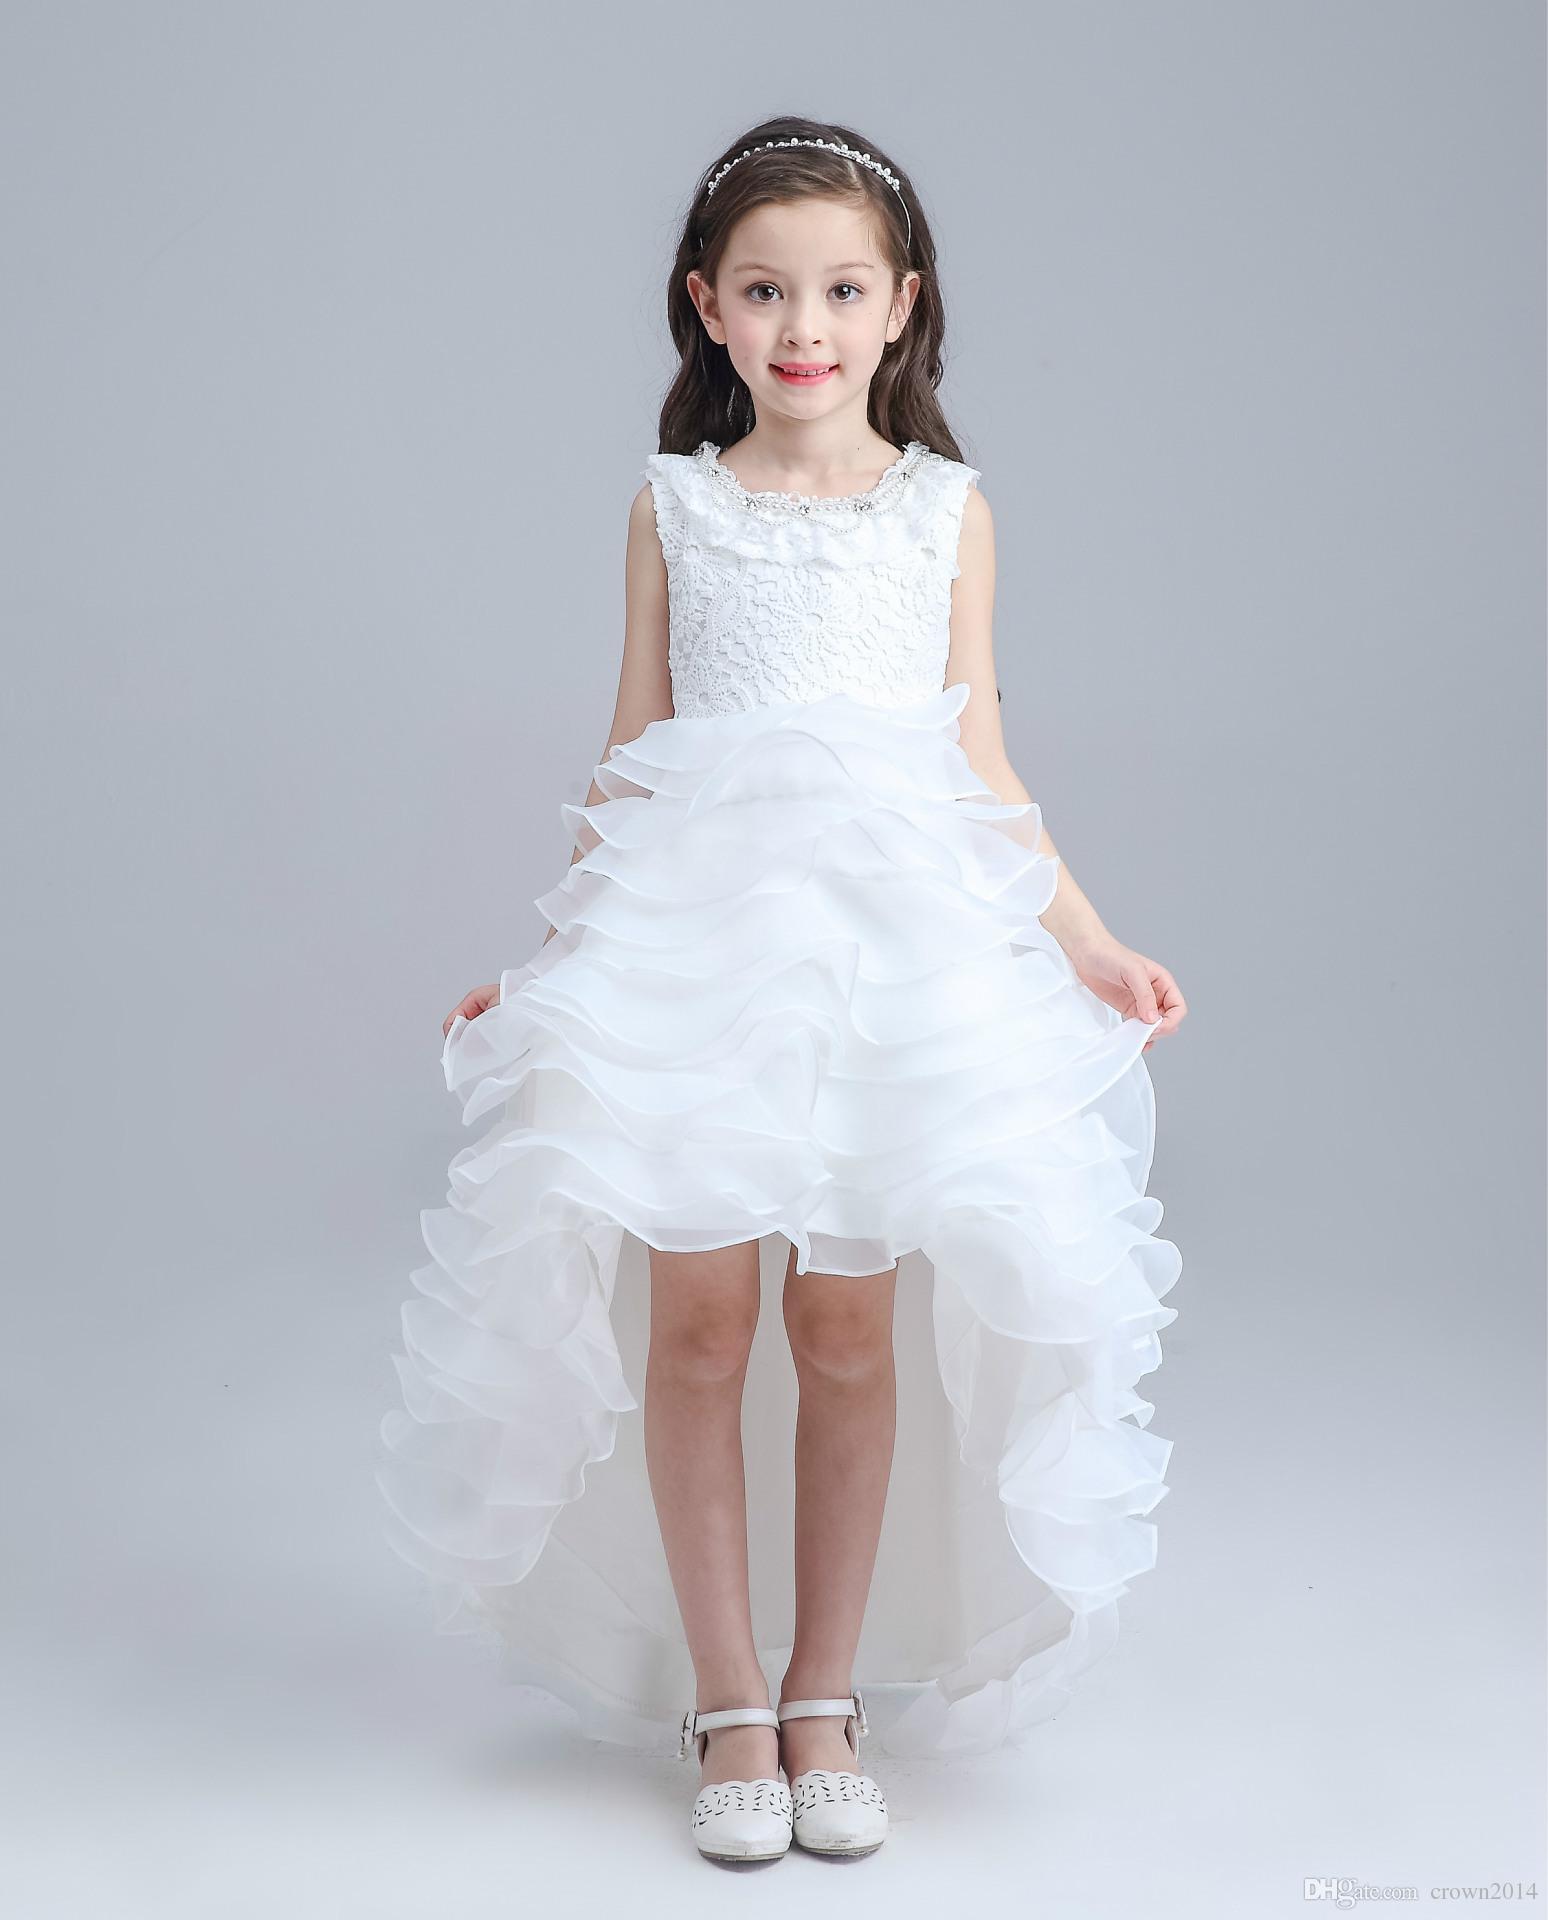 Kids Toddler Flower Girl Party Pageant Dress Wedding Bridesmaid Dresses Princess